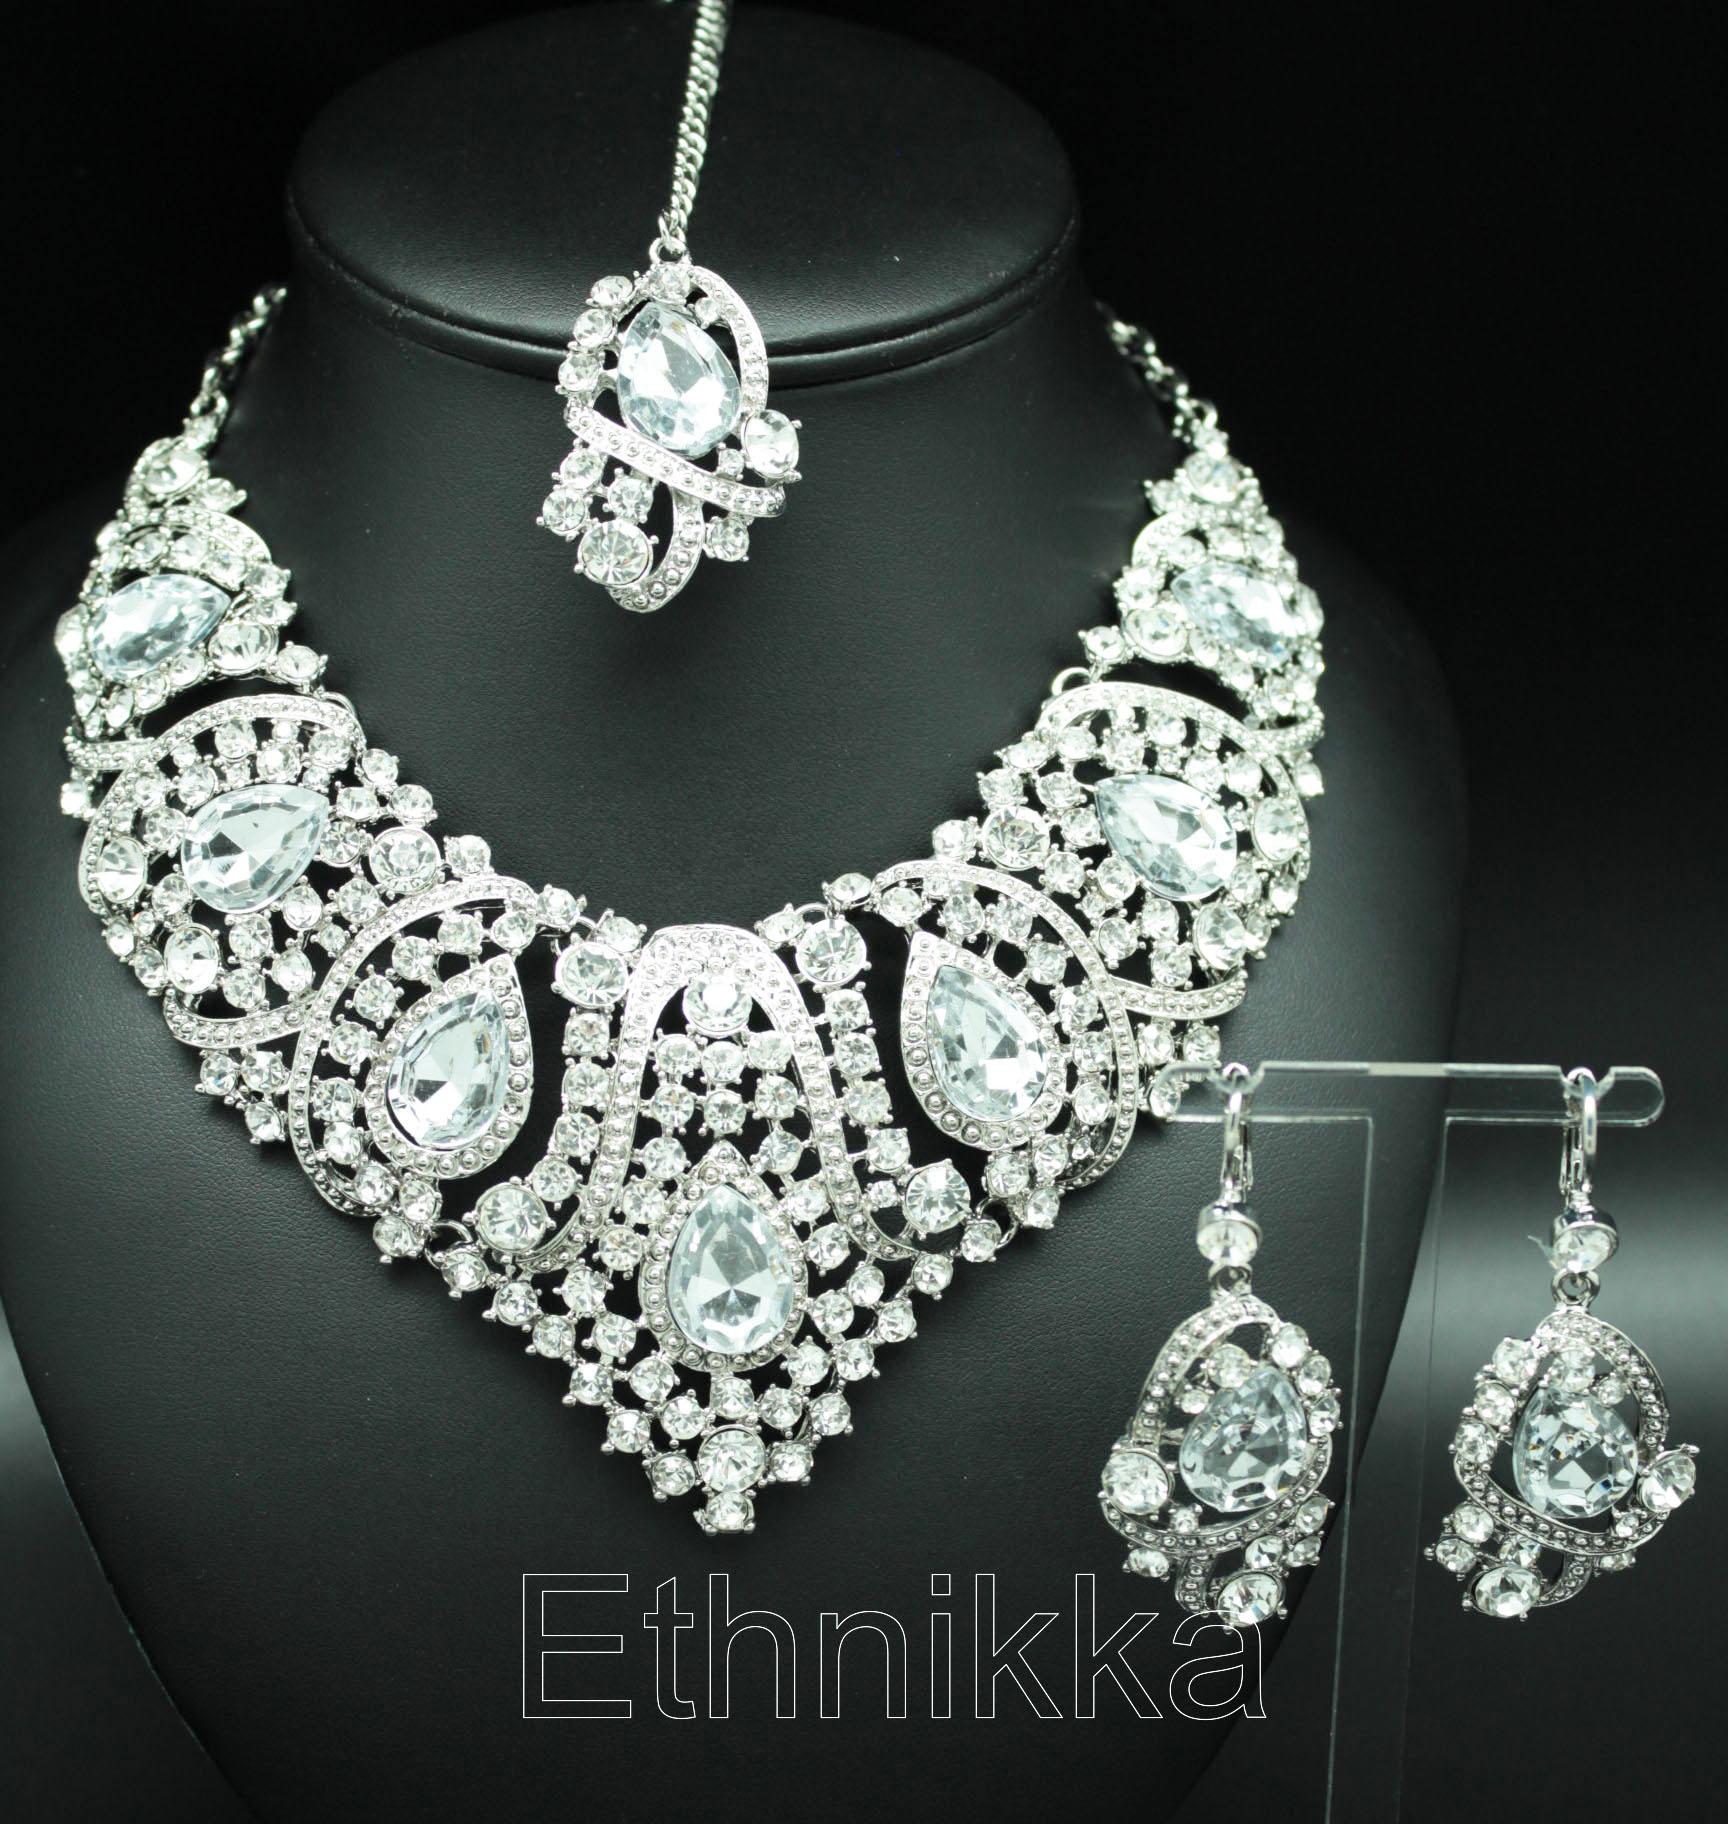 Bijoux ethniques Acheter des bijoux import - Ethnikka.fr 9f925af77f9e